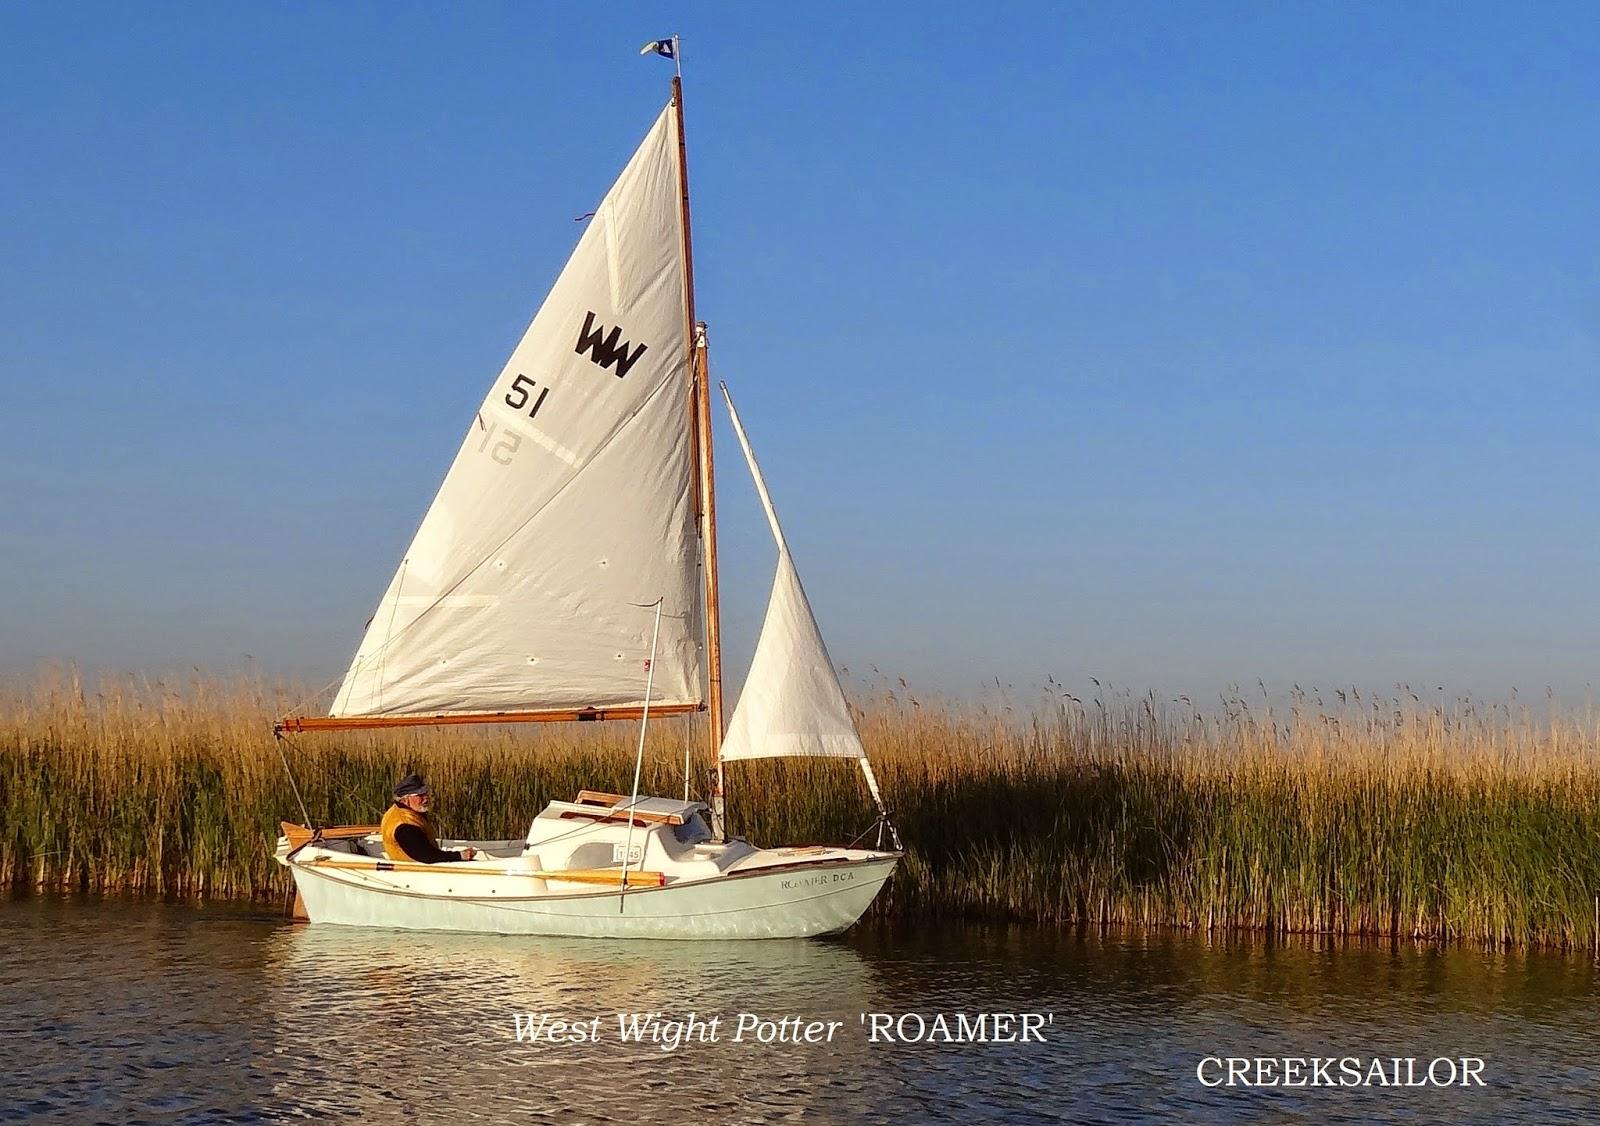 Creeksailor West Wight Potter